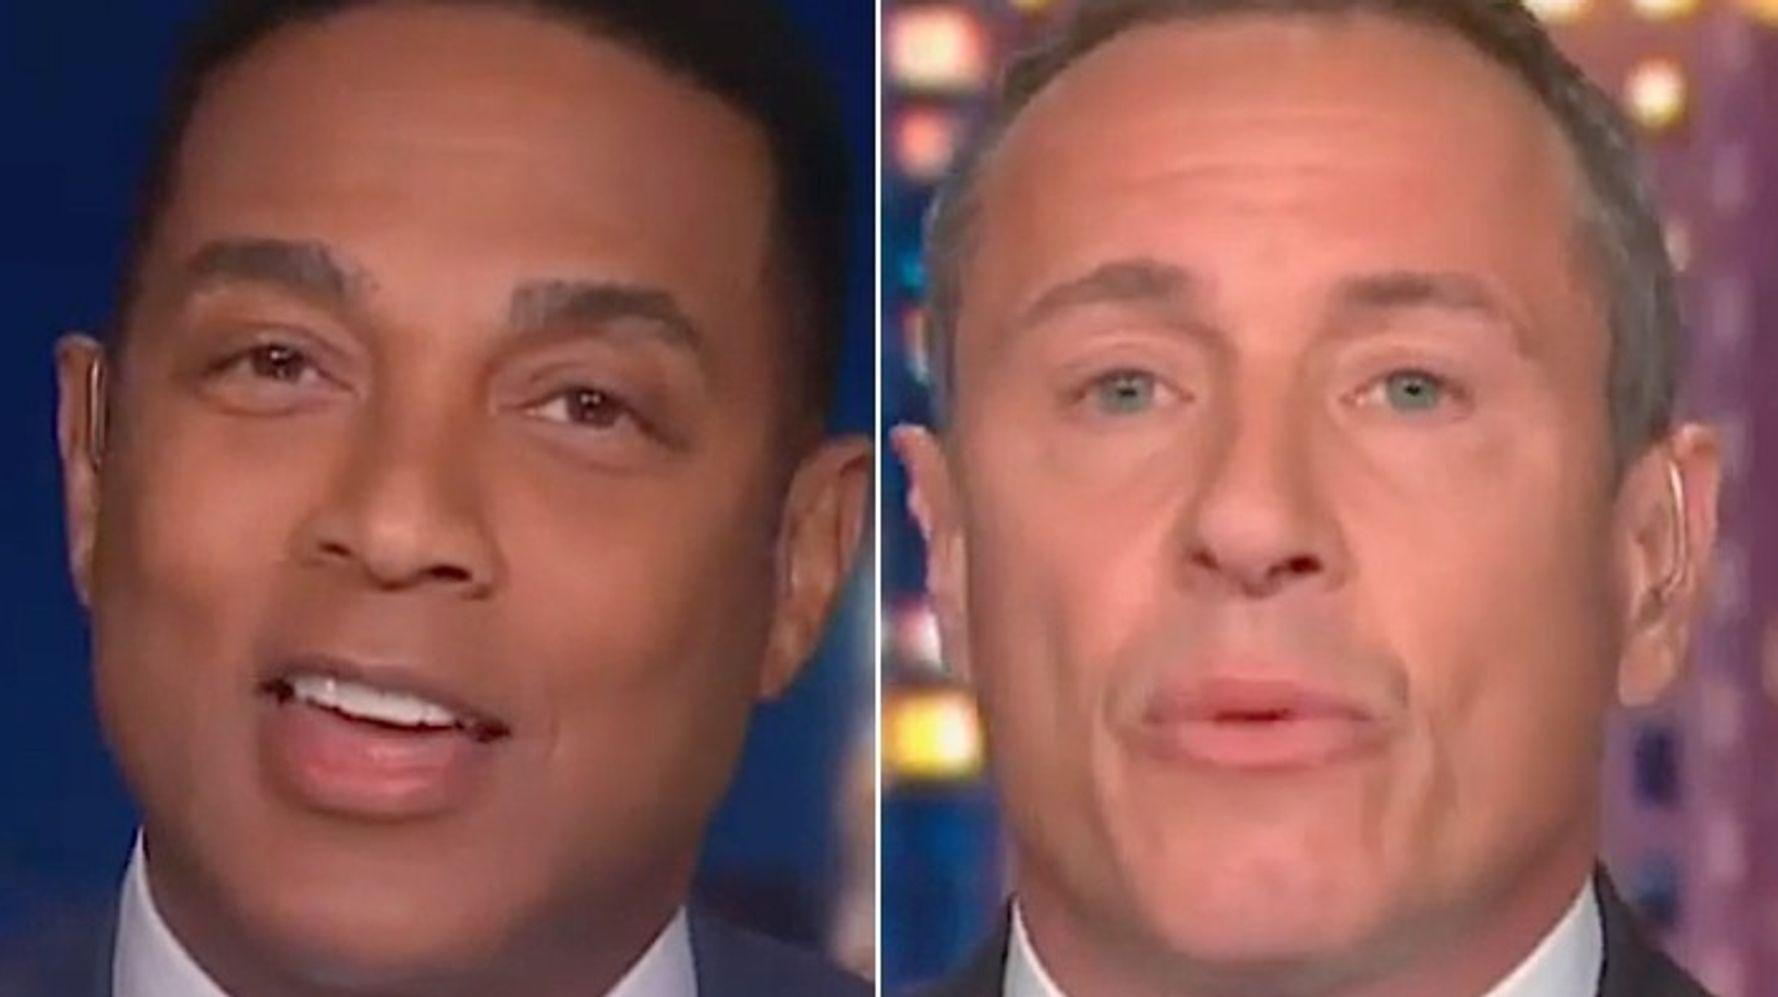 'Furious' Don Lemon Loses His Cool After Chris Cuomo Has Rick Santorum On